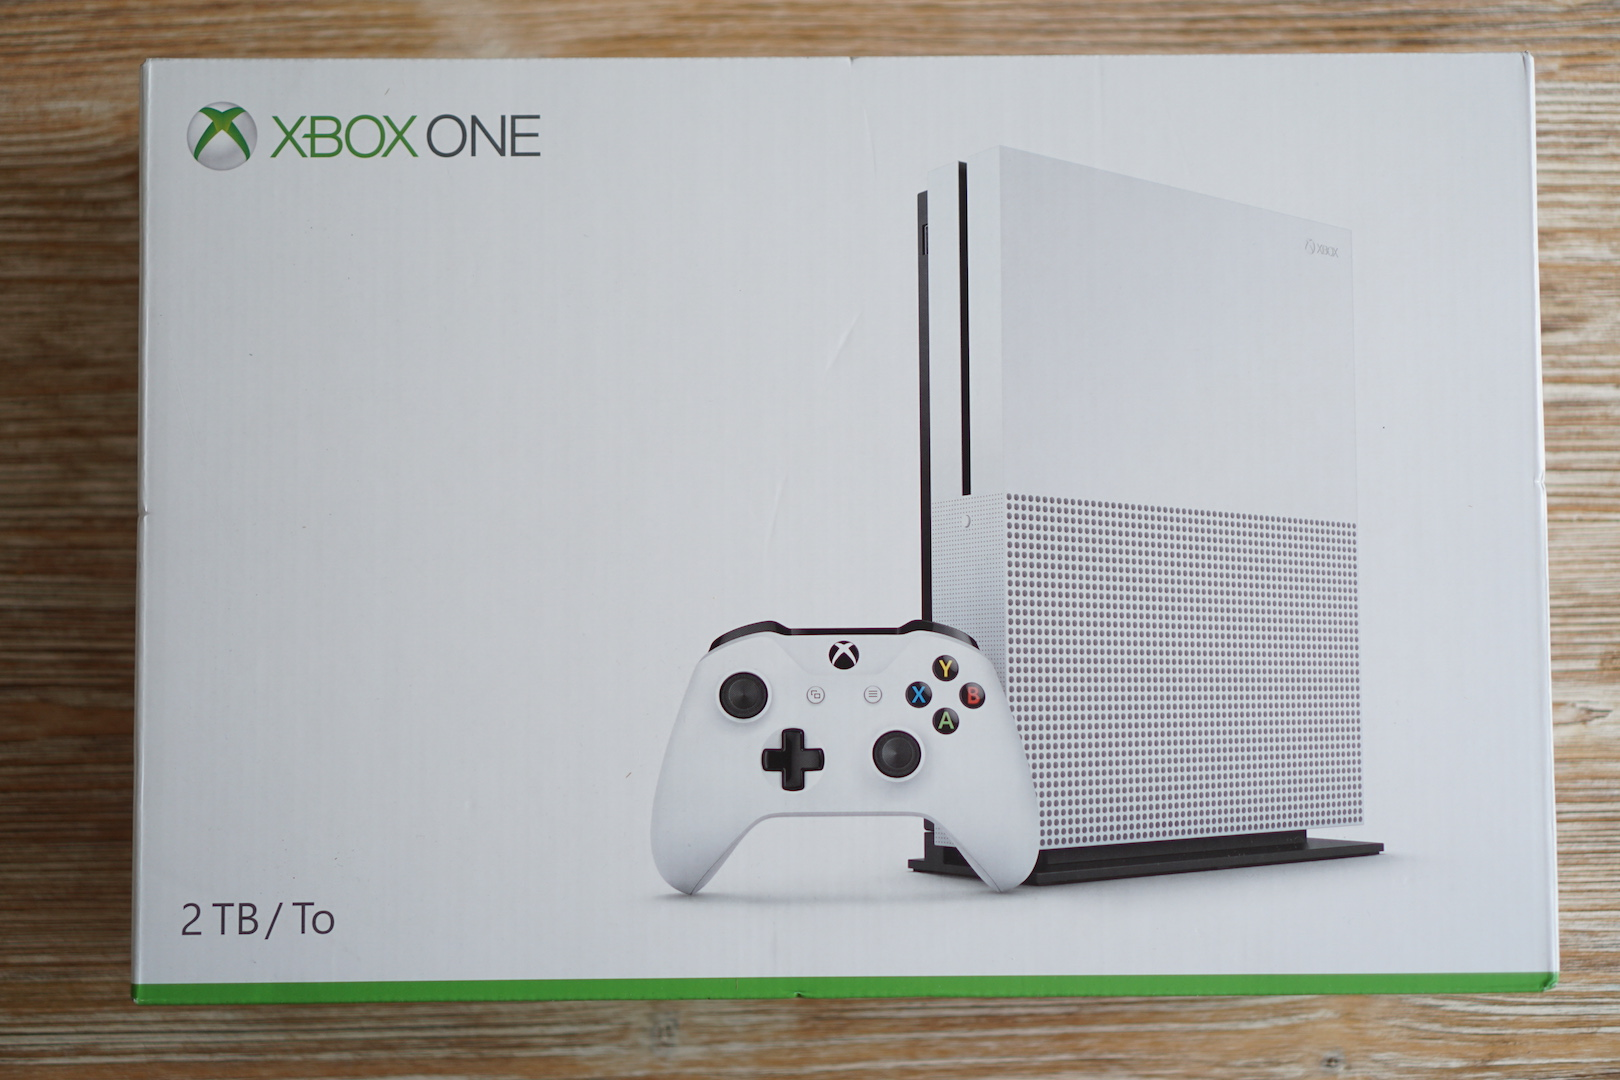 Unboxing Xbox One S